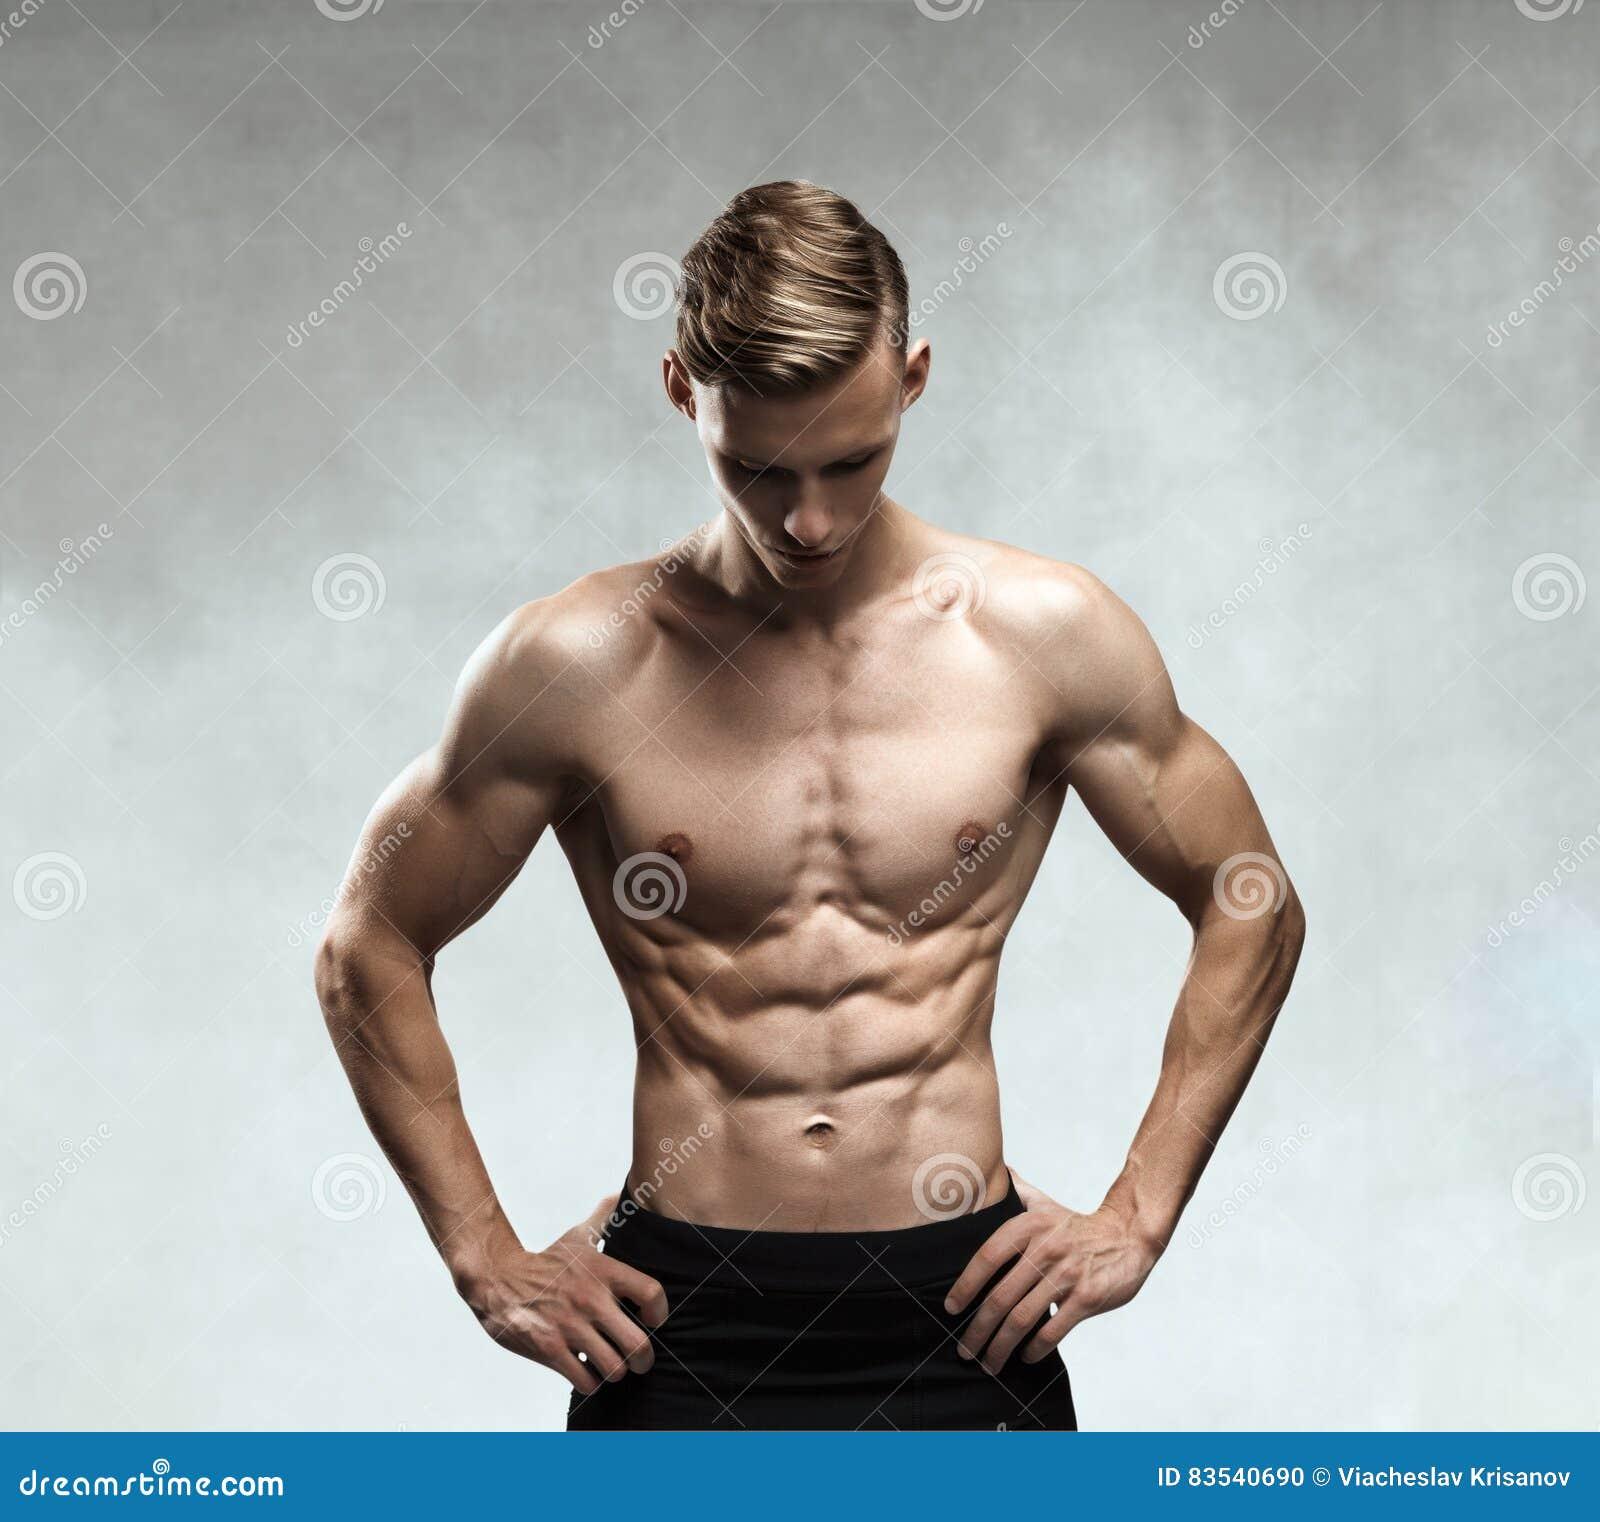 Male torso stock photo. Image of biceps, masculinity